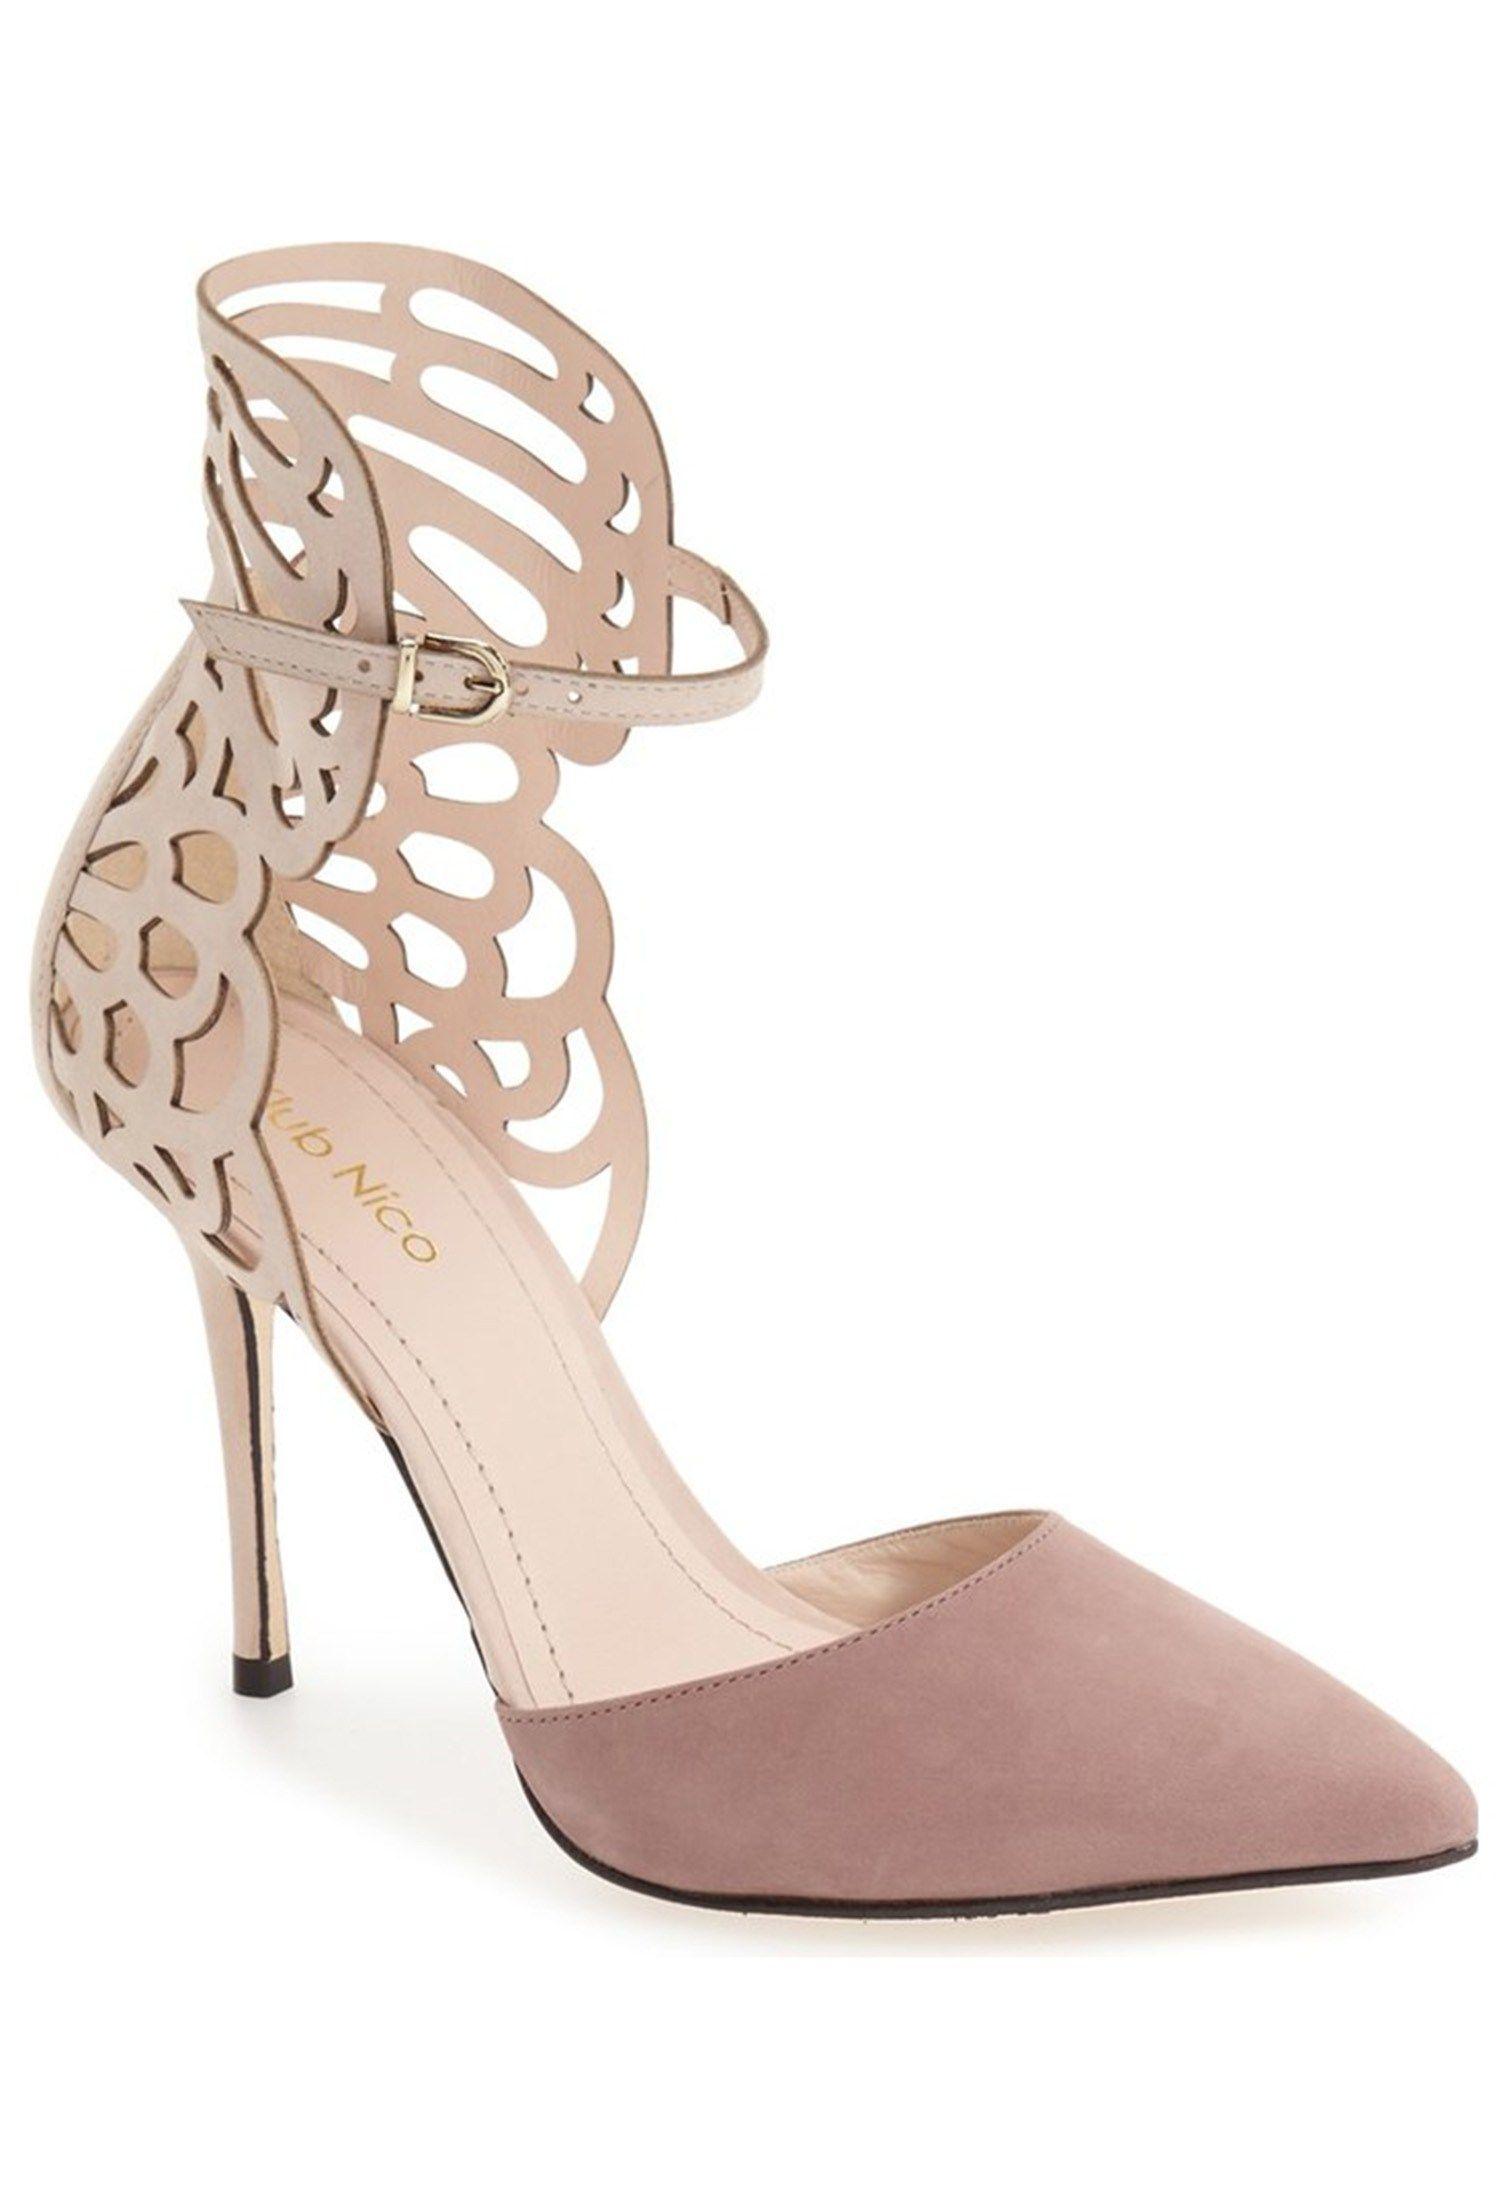 Regina Pointy Toe Pump Green Wedding Shoes Pointy Toe Pumps Toms Wedding Shoes Heels